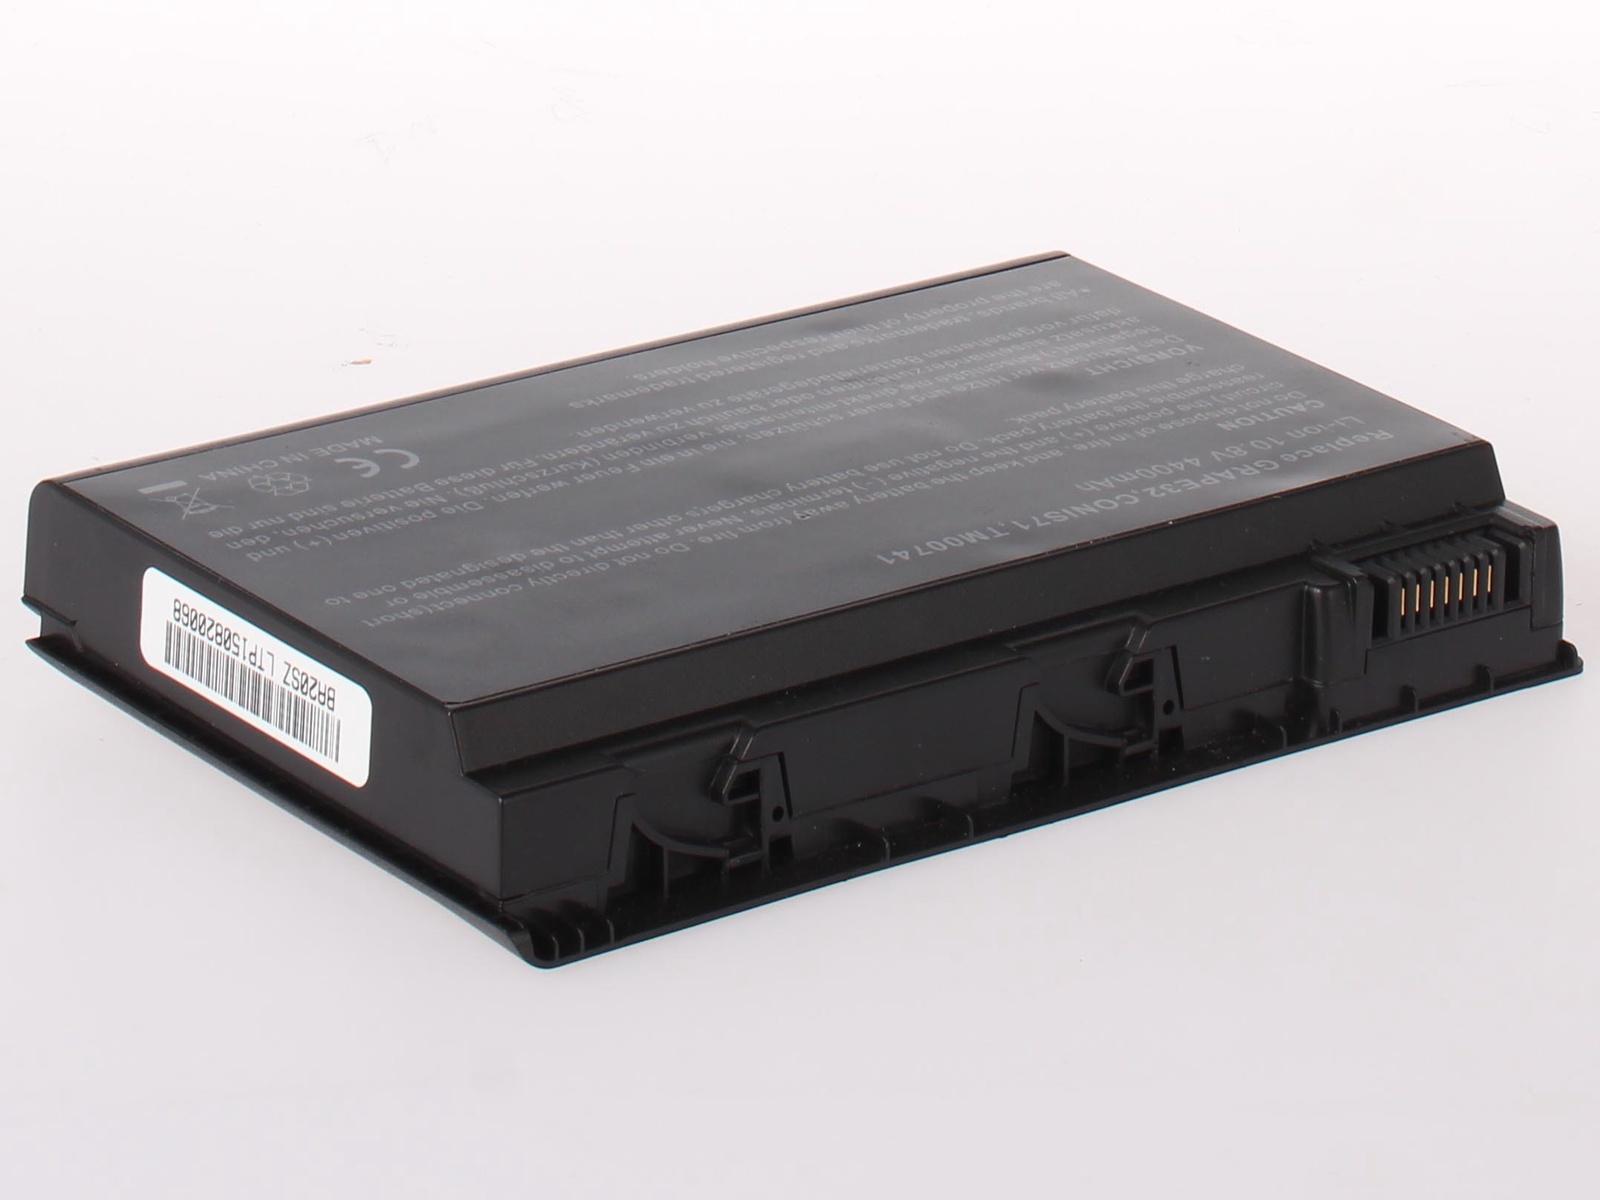 Аккумулятор для ноутбука AnyBatt для Acer Extensa 7220, TravelMate 7720G, TravelMate 6592G, TravelMate 6460, Extensa 5420, Extensa 5620-1A1G16Mi, TravelMate 7720, Extensa 5520, Extensa 5430-622G16Mi, TravelMate 5310 цены